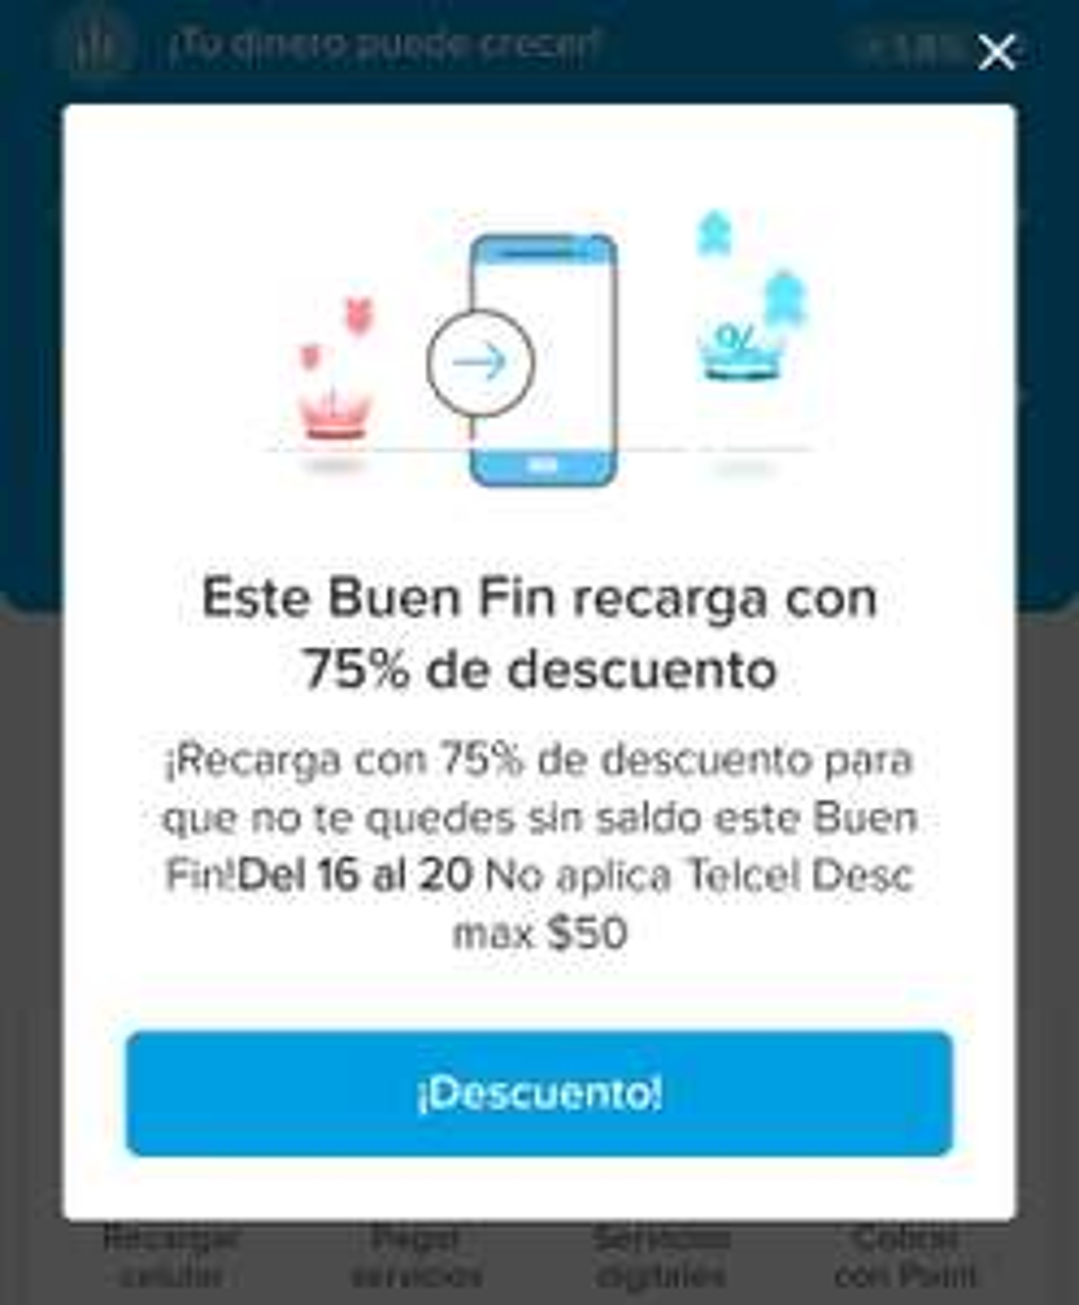 Mercado pago 75% de descuento en recargas